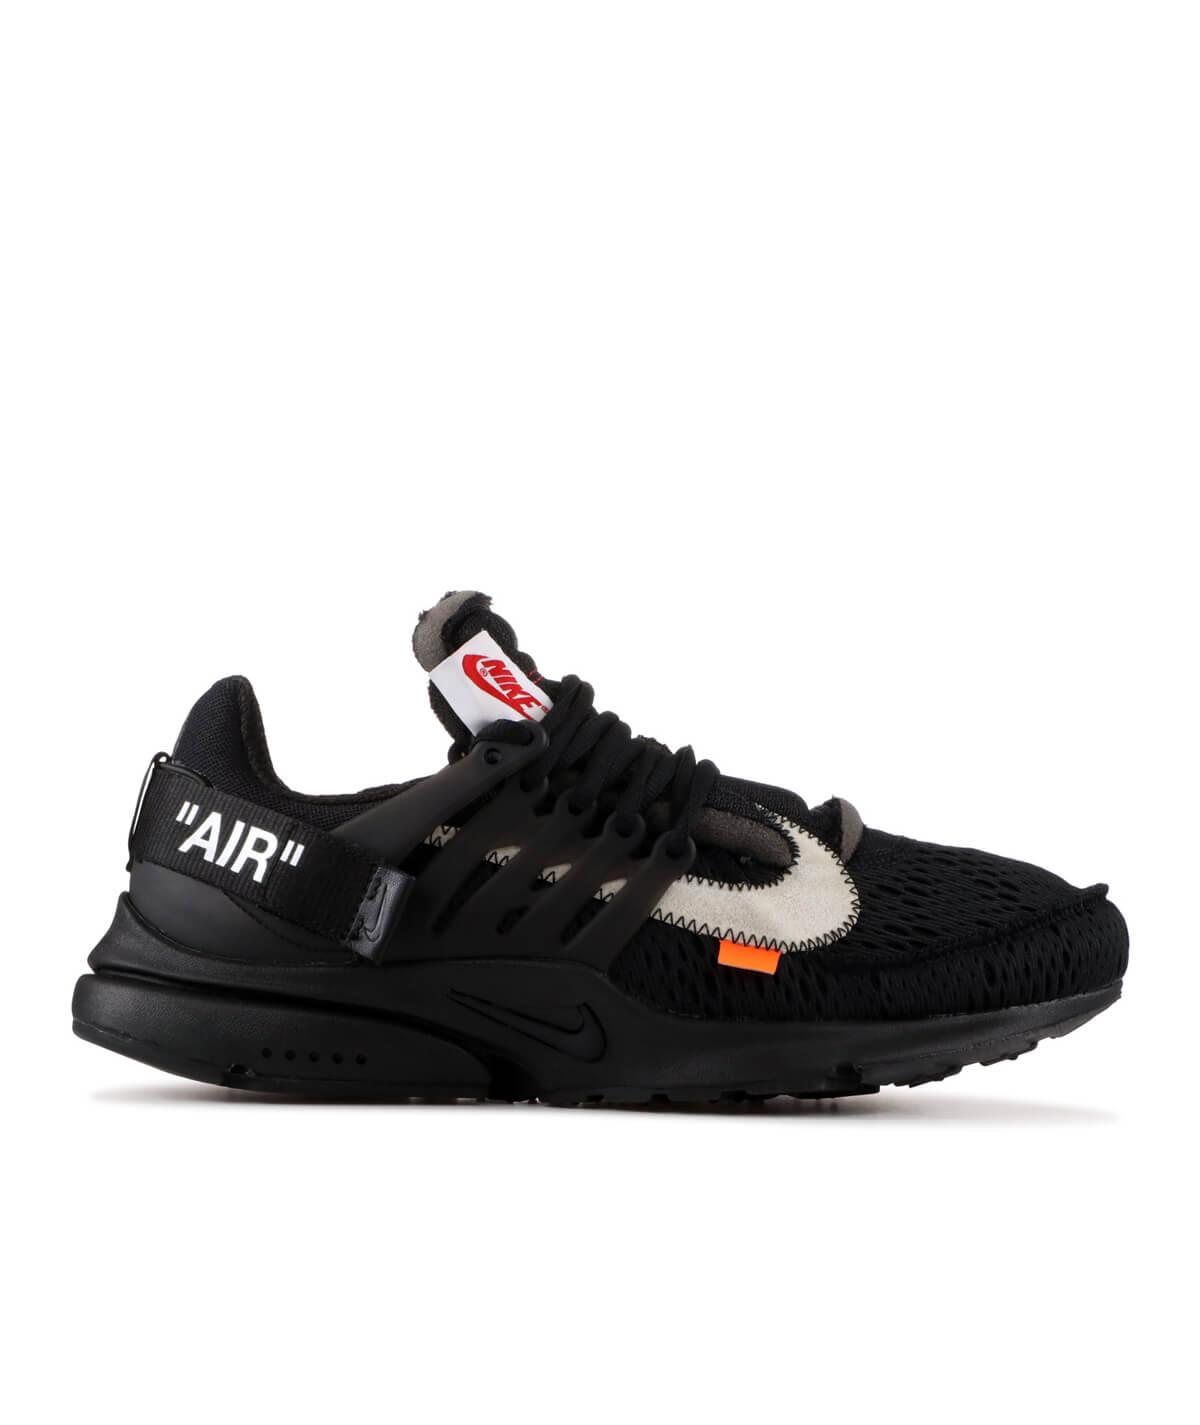 best sneakers ac8d6 9b36b ... coupon nike air presto cc54b f33ad